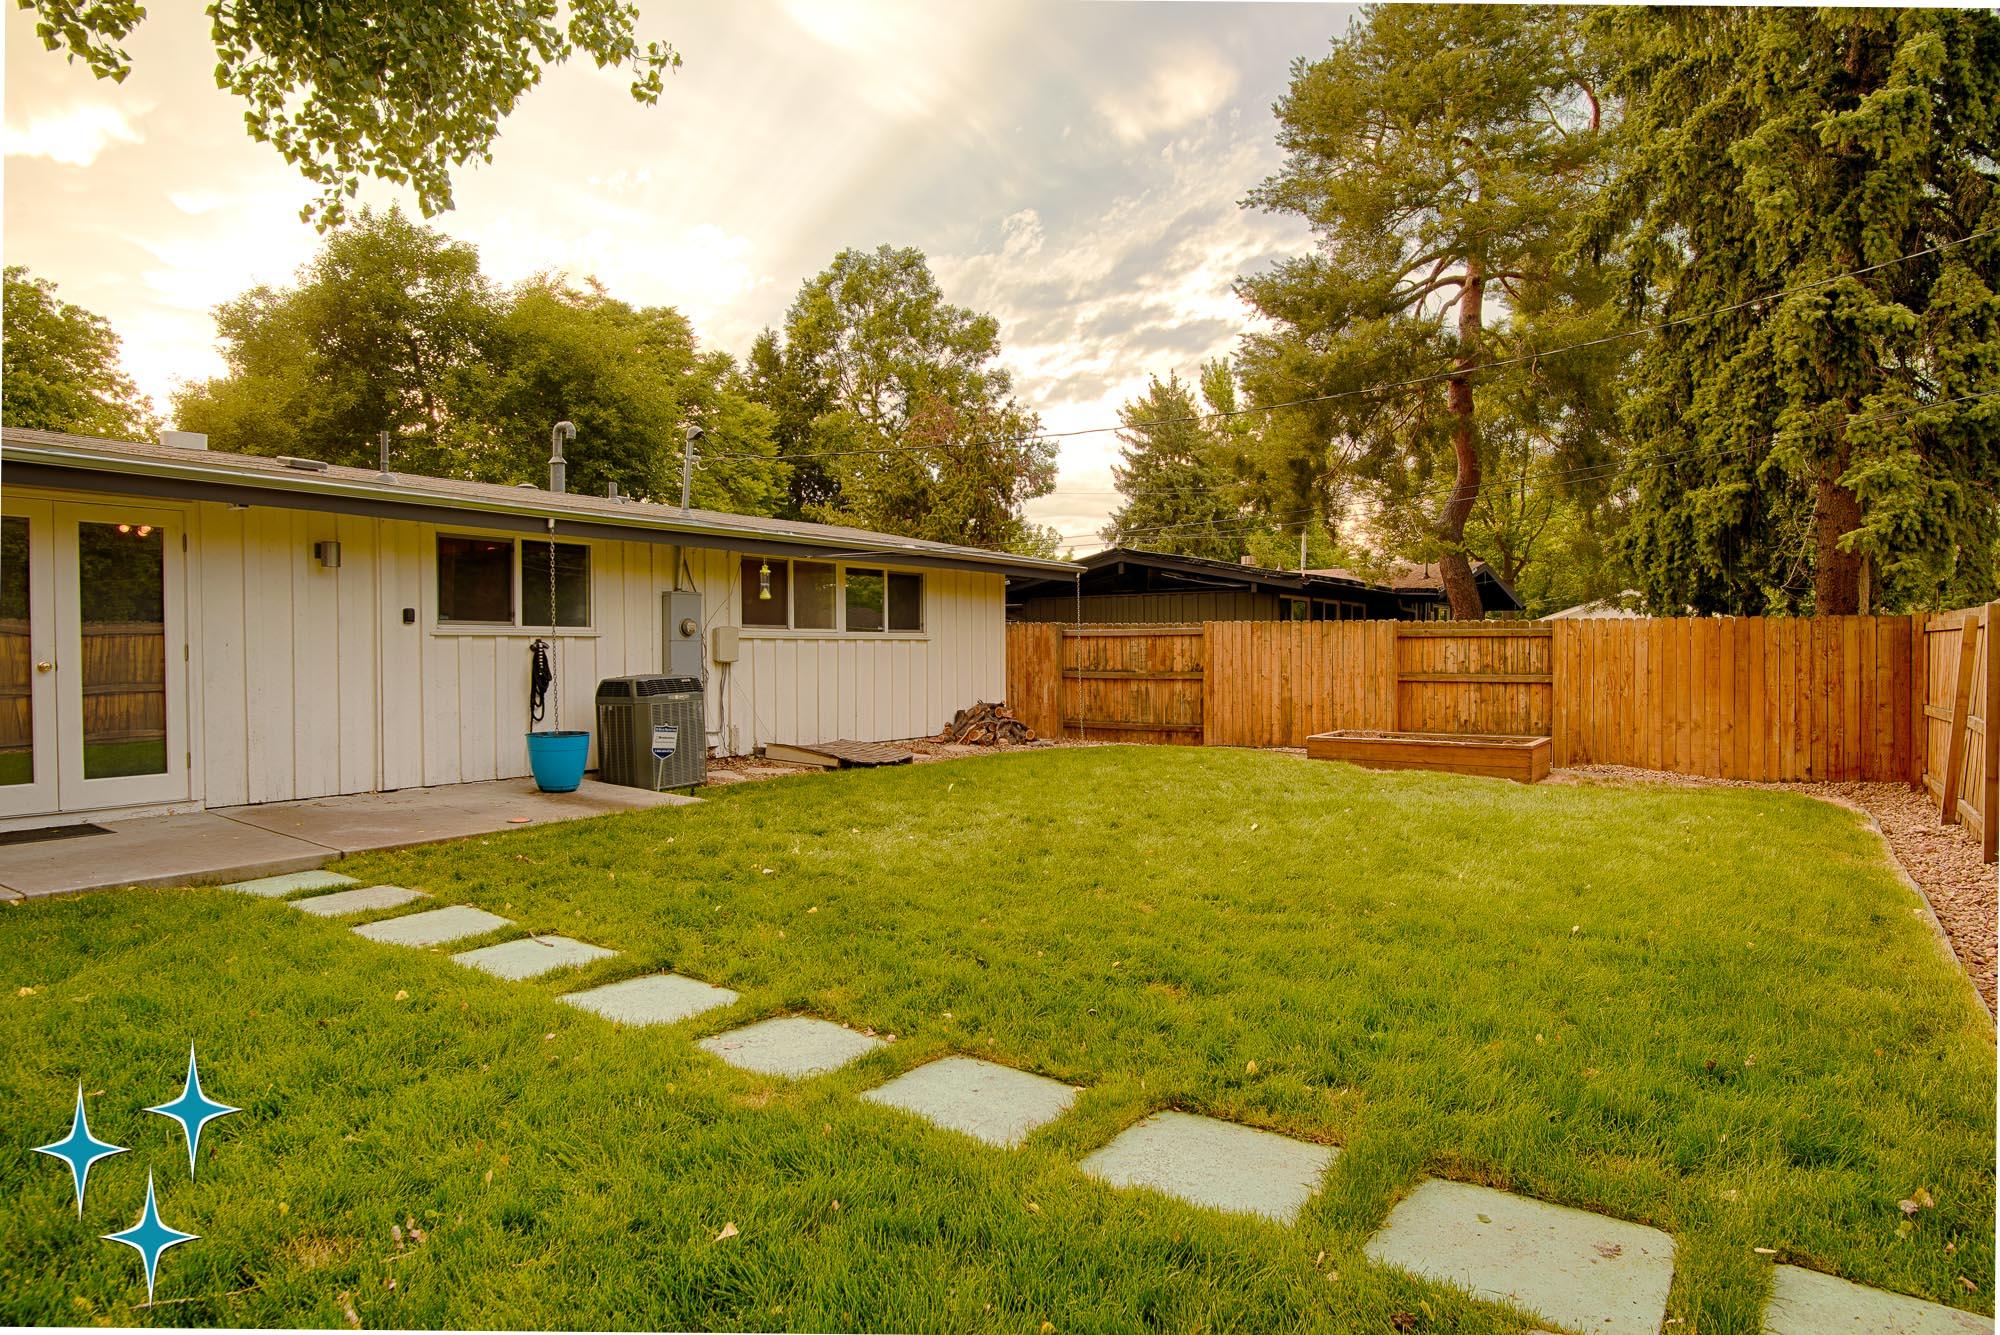 Adrian-Kinney-2510-S-Lowell-Boulevard-Denver-Cliff-May-Harvey-Park-2000w50-3SWM-22.jpg